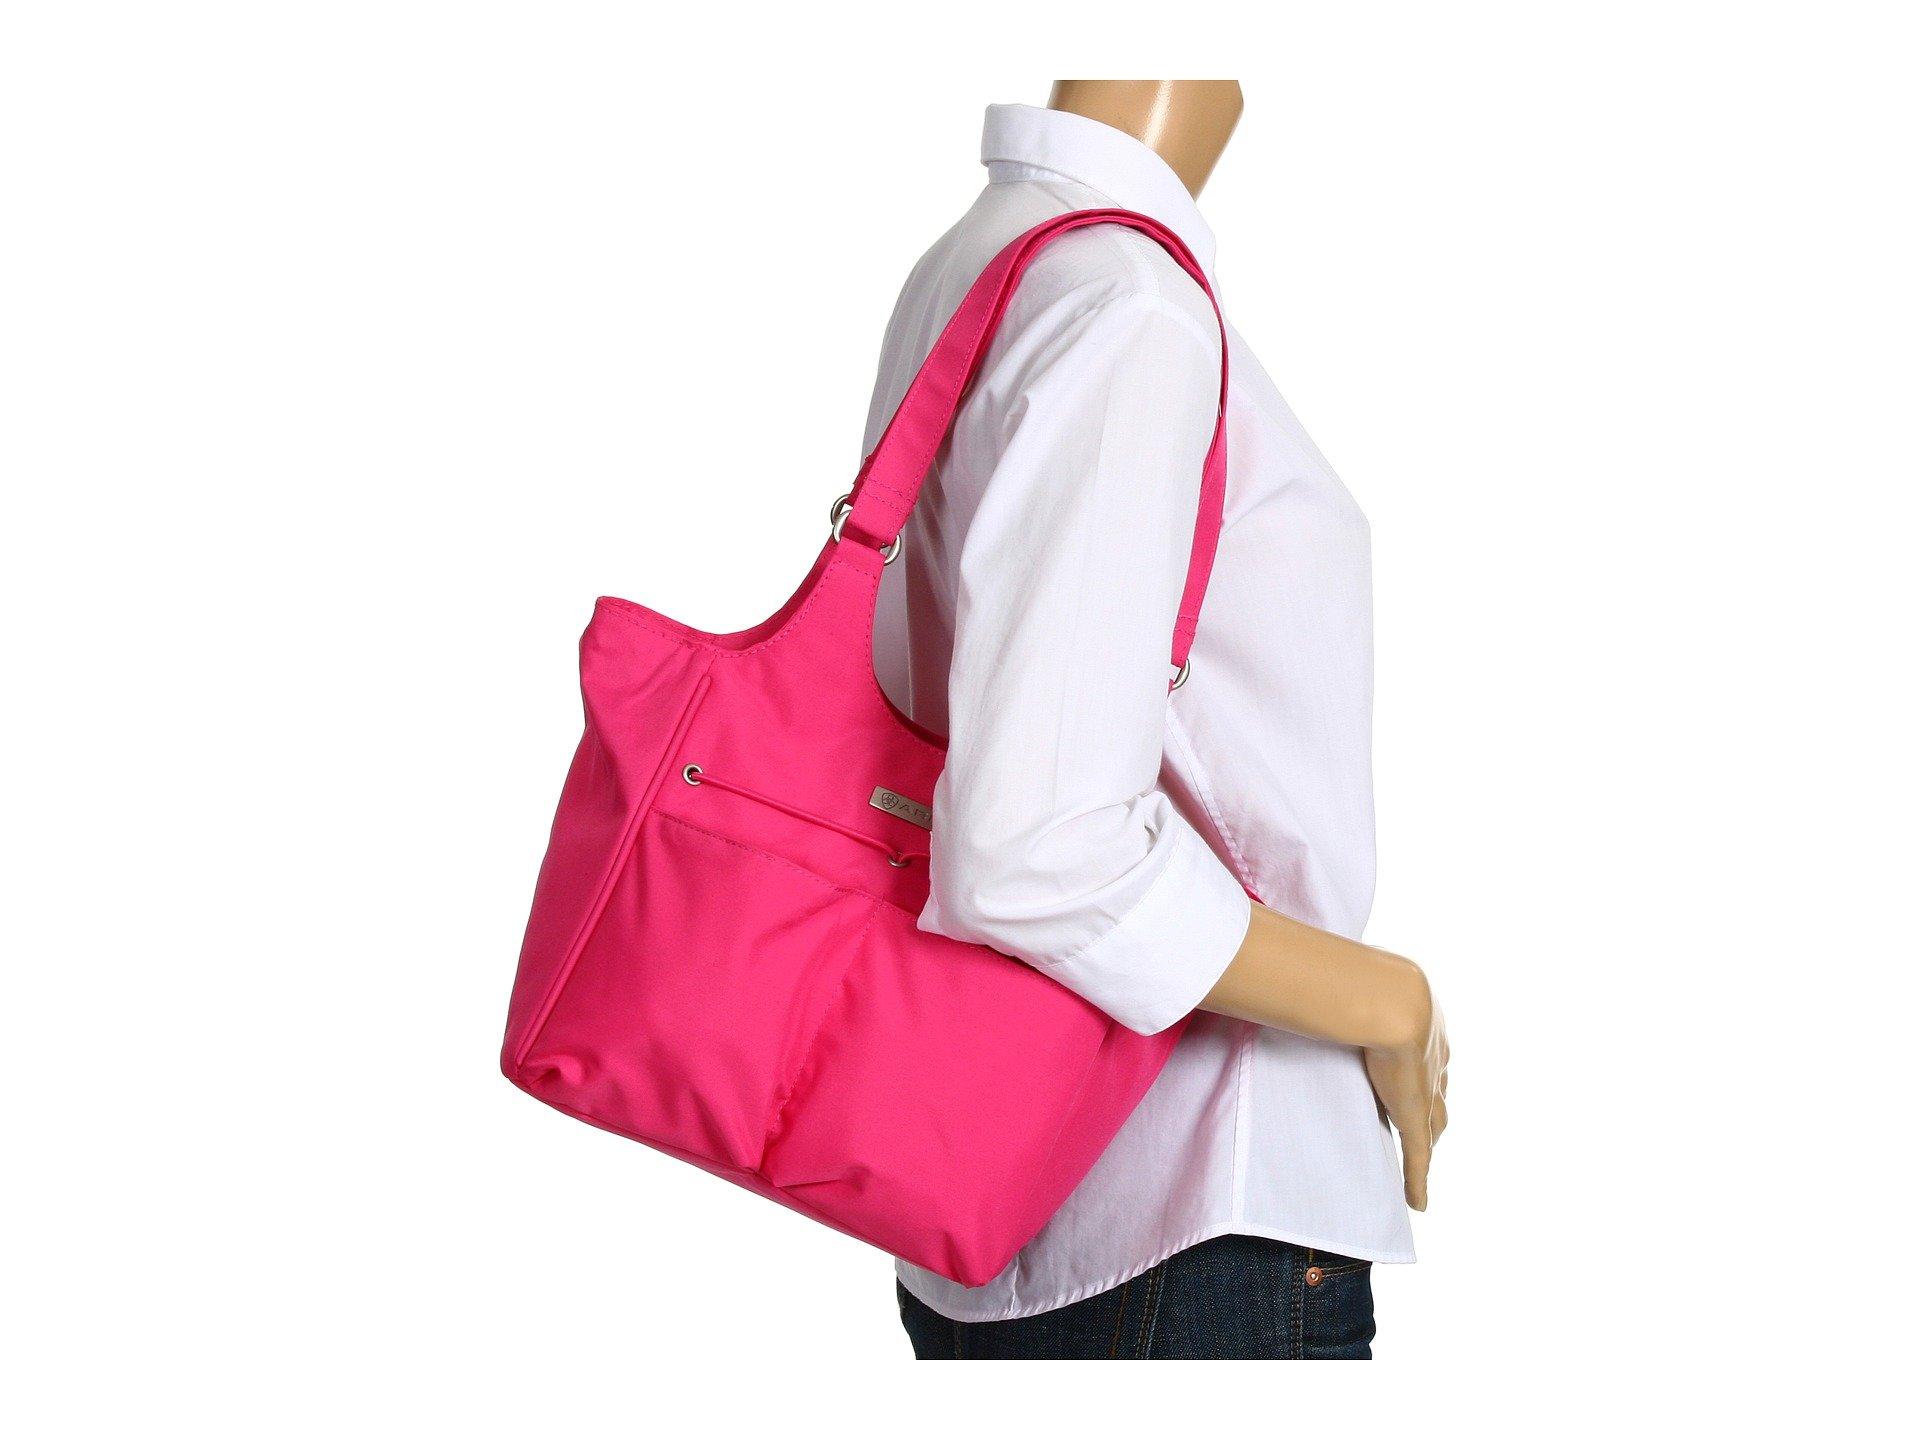 Carry Mini Ariat Mini Raspberry Ariat Carry Raspberry All All Ariat Carry All Raspberry Mini HqB8Uw